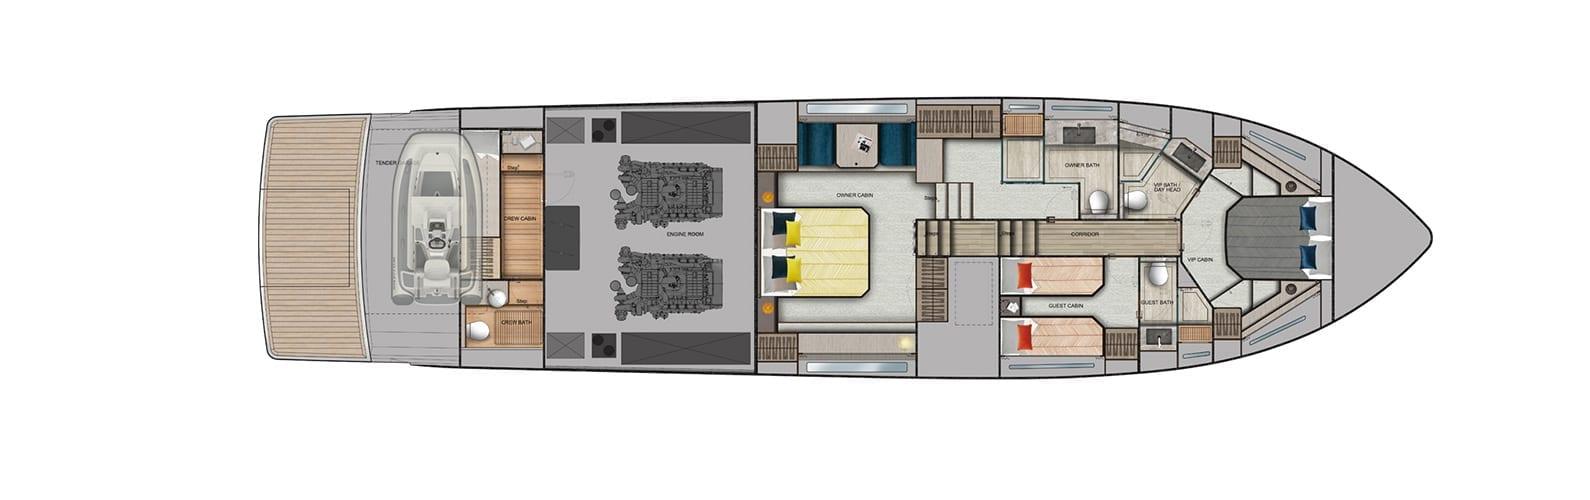 uniesse-ss-8-floor-plan-3